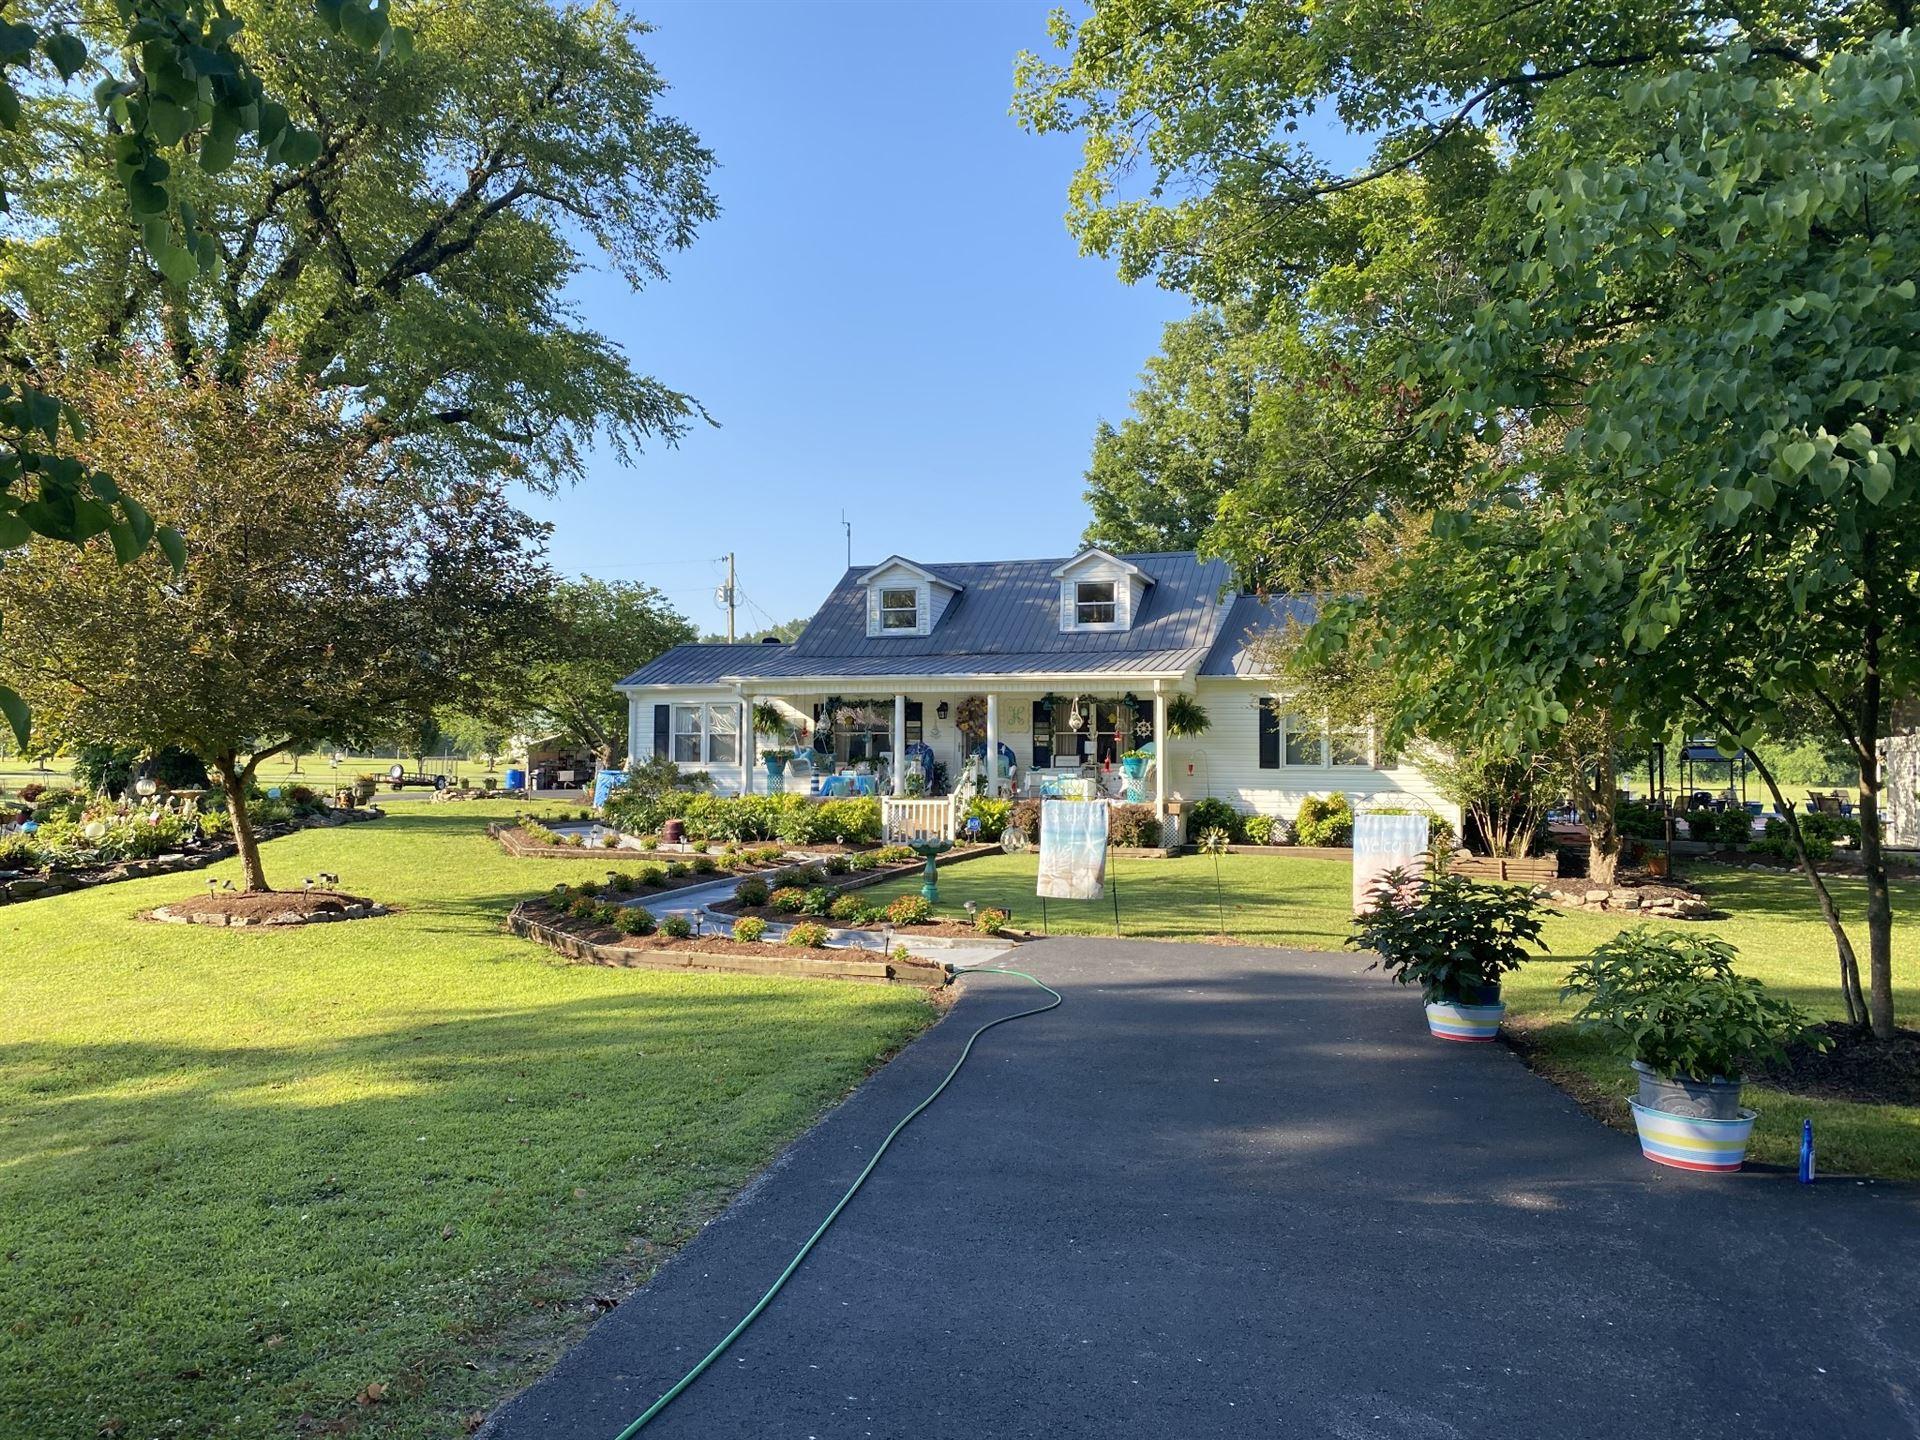 Photo of 3010 Arnold Hollow Rd, Waynesboro, TN 38485 (MLS # 2161682)